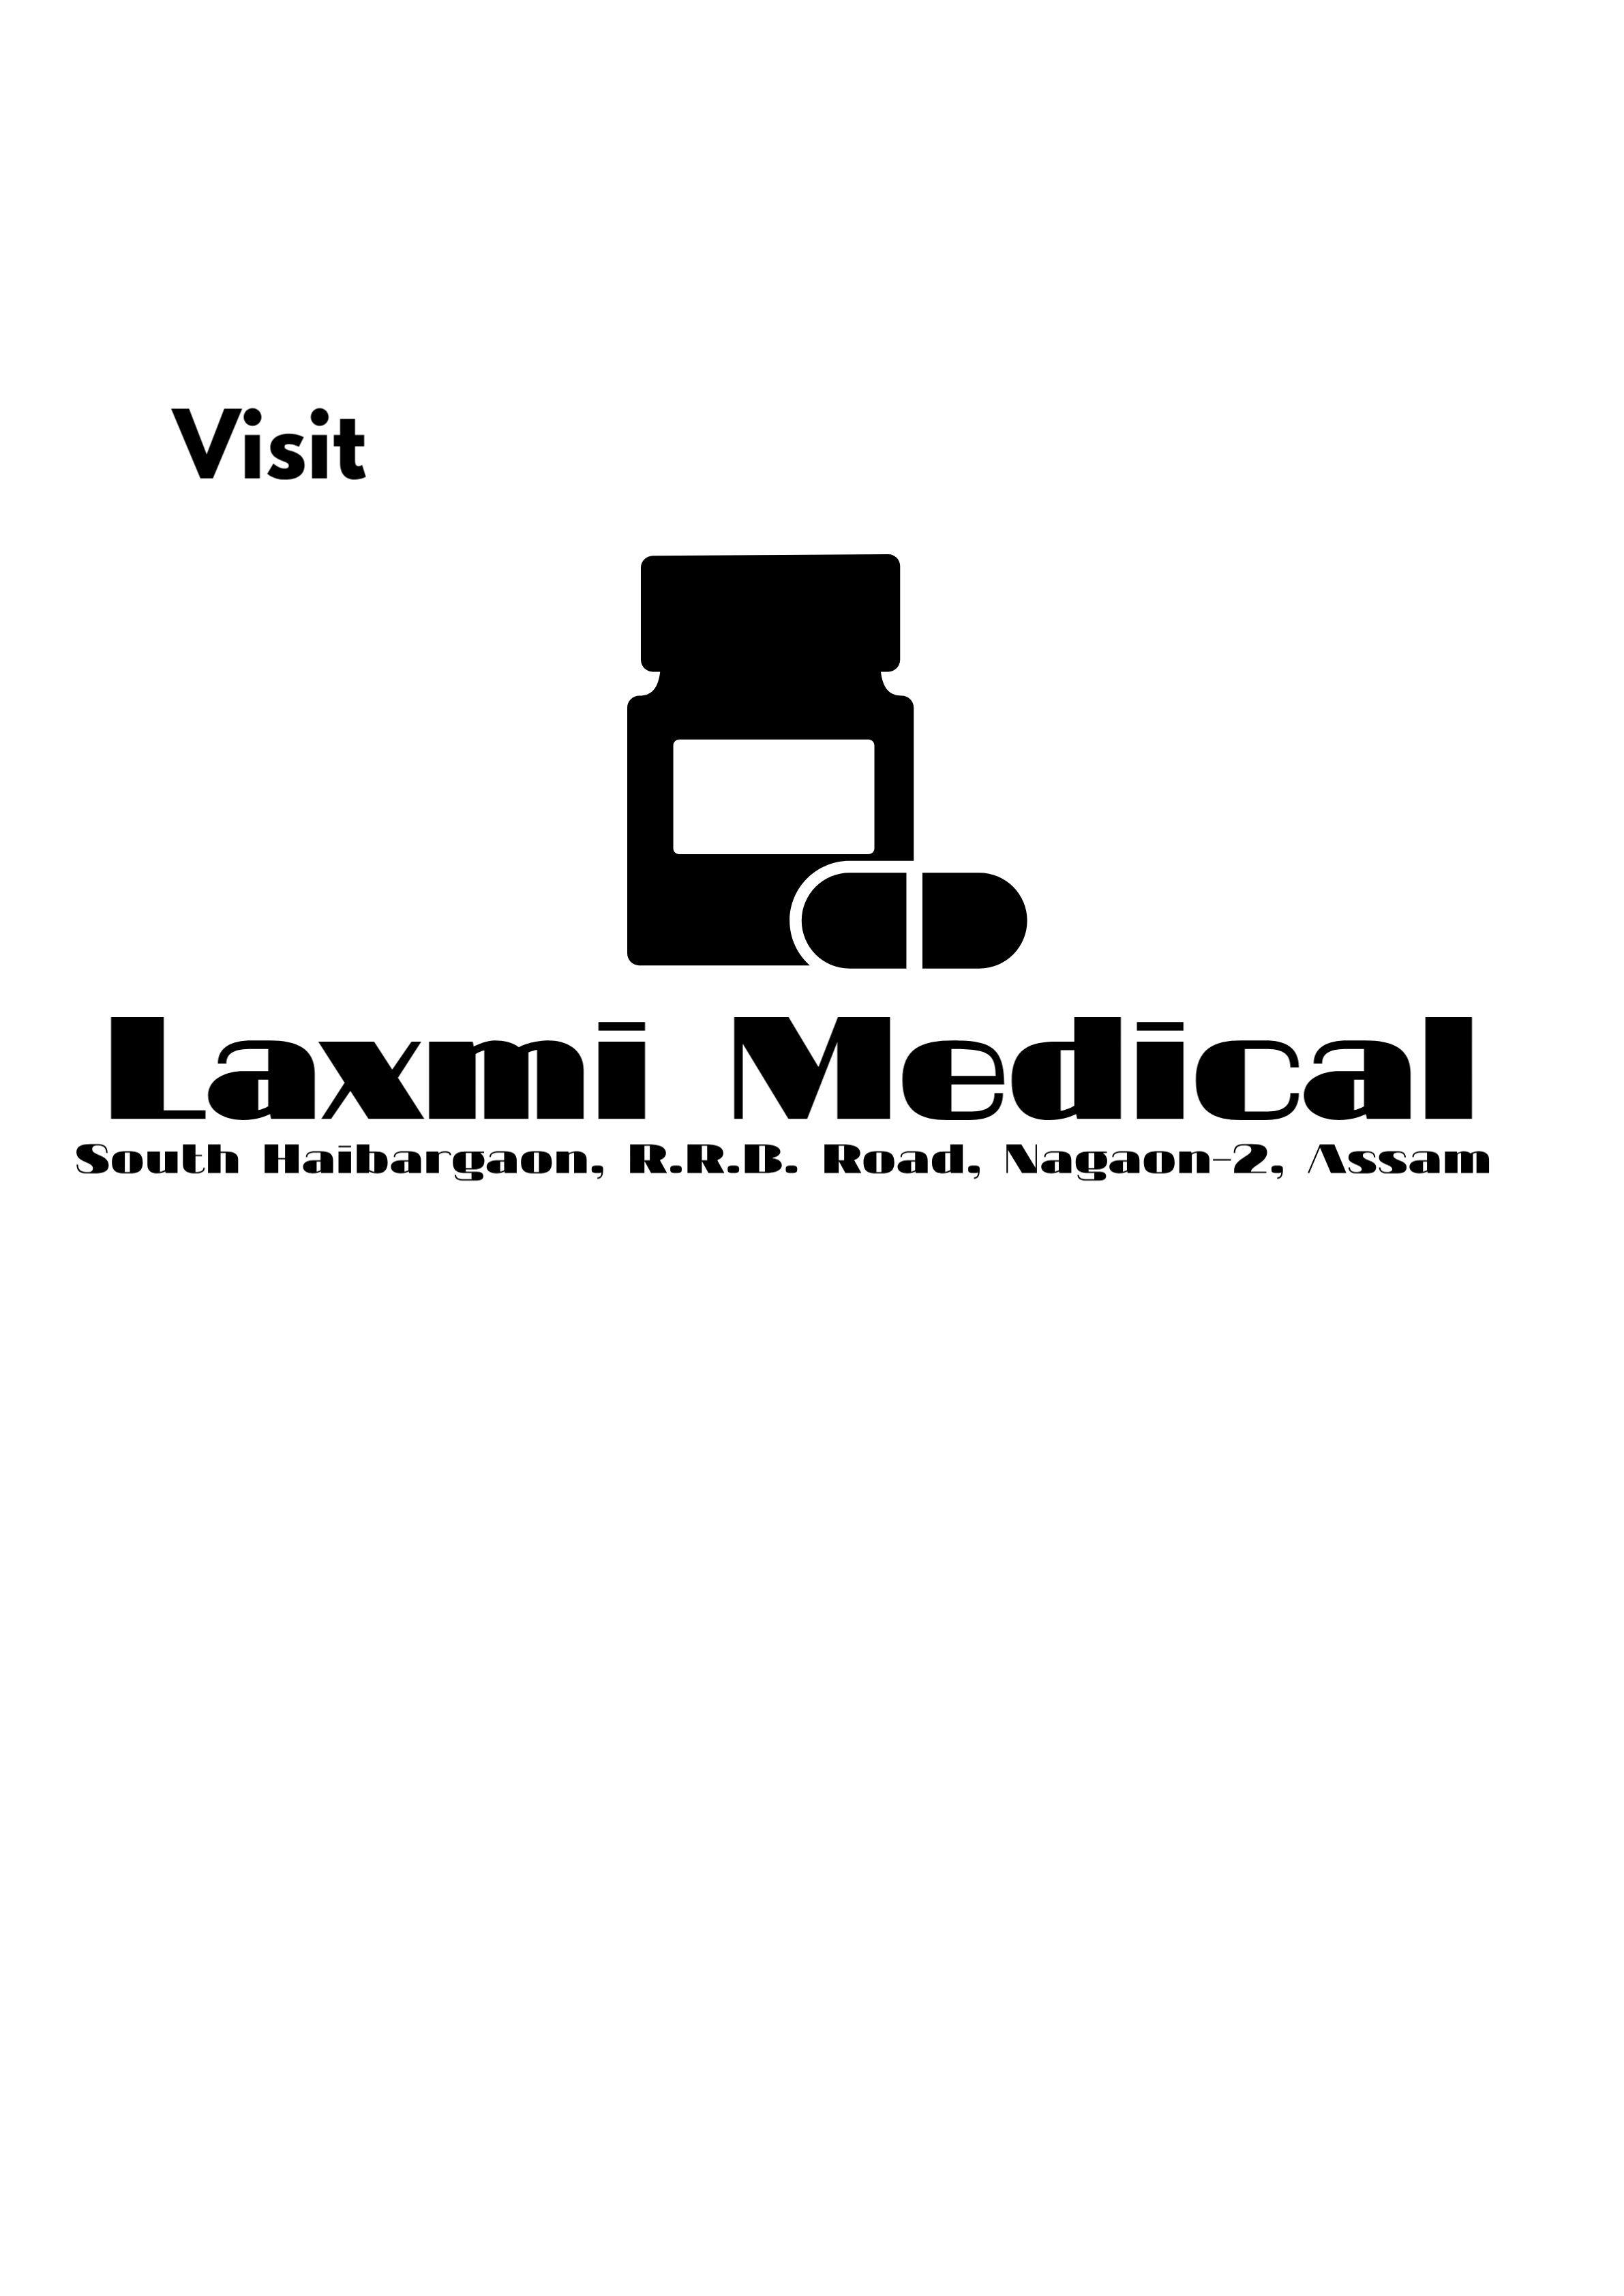 Laxmi Medical